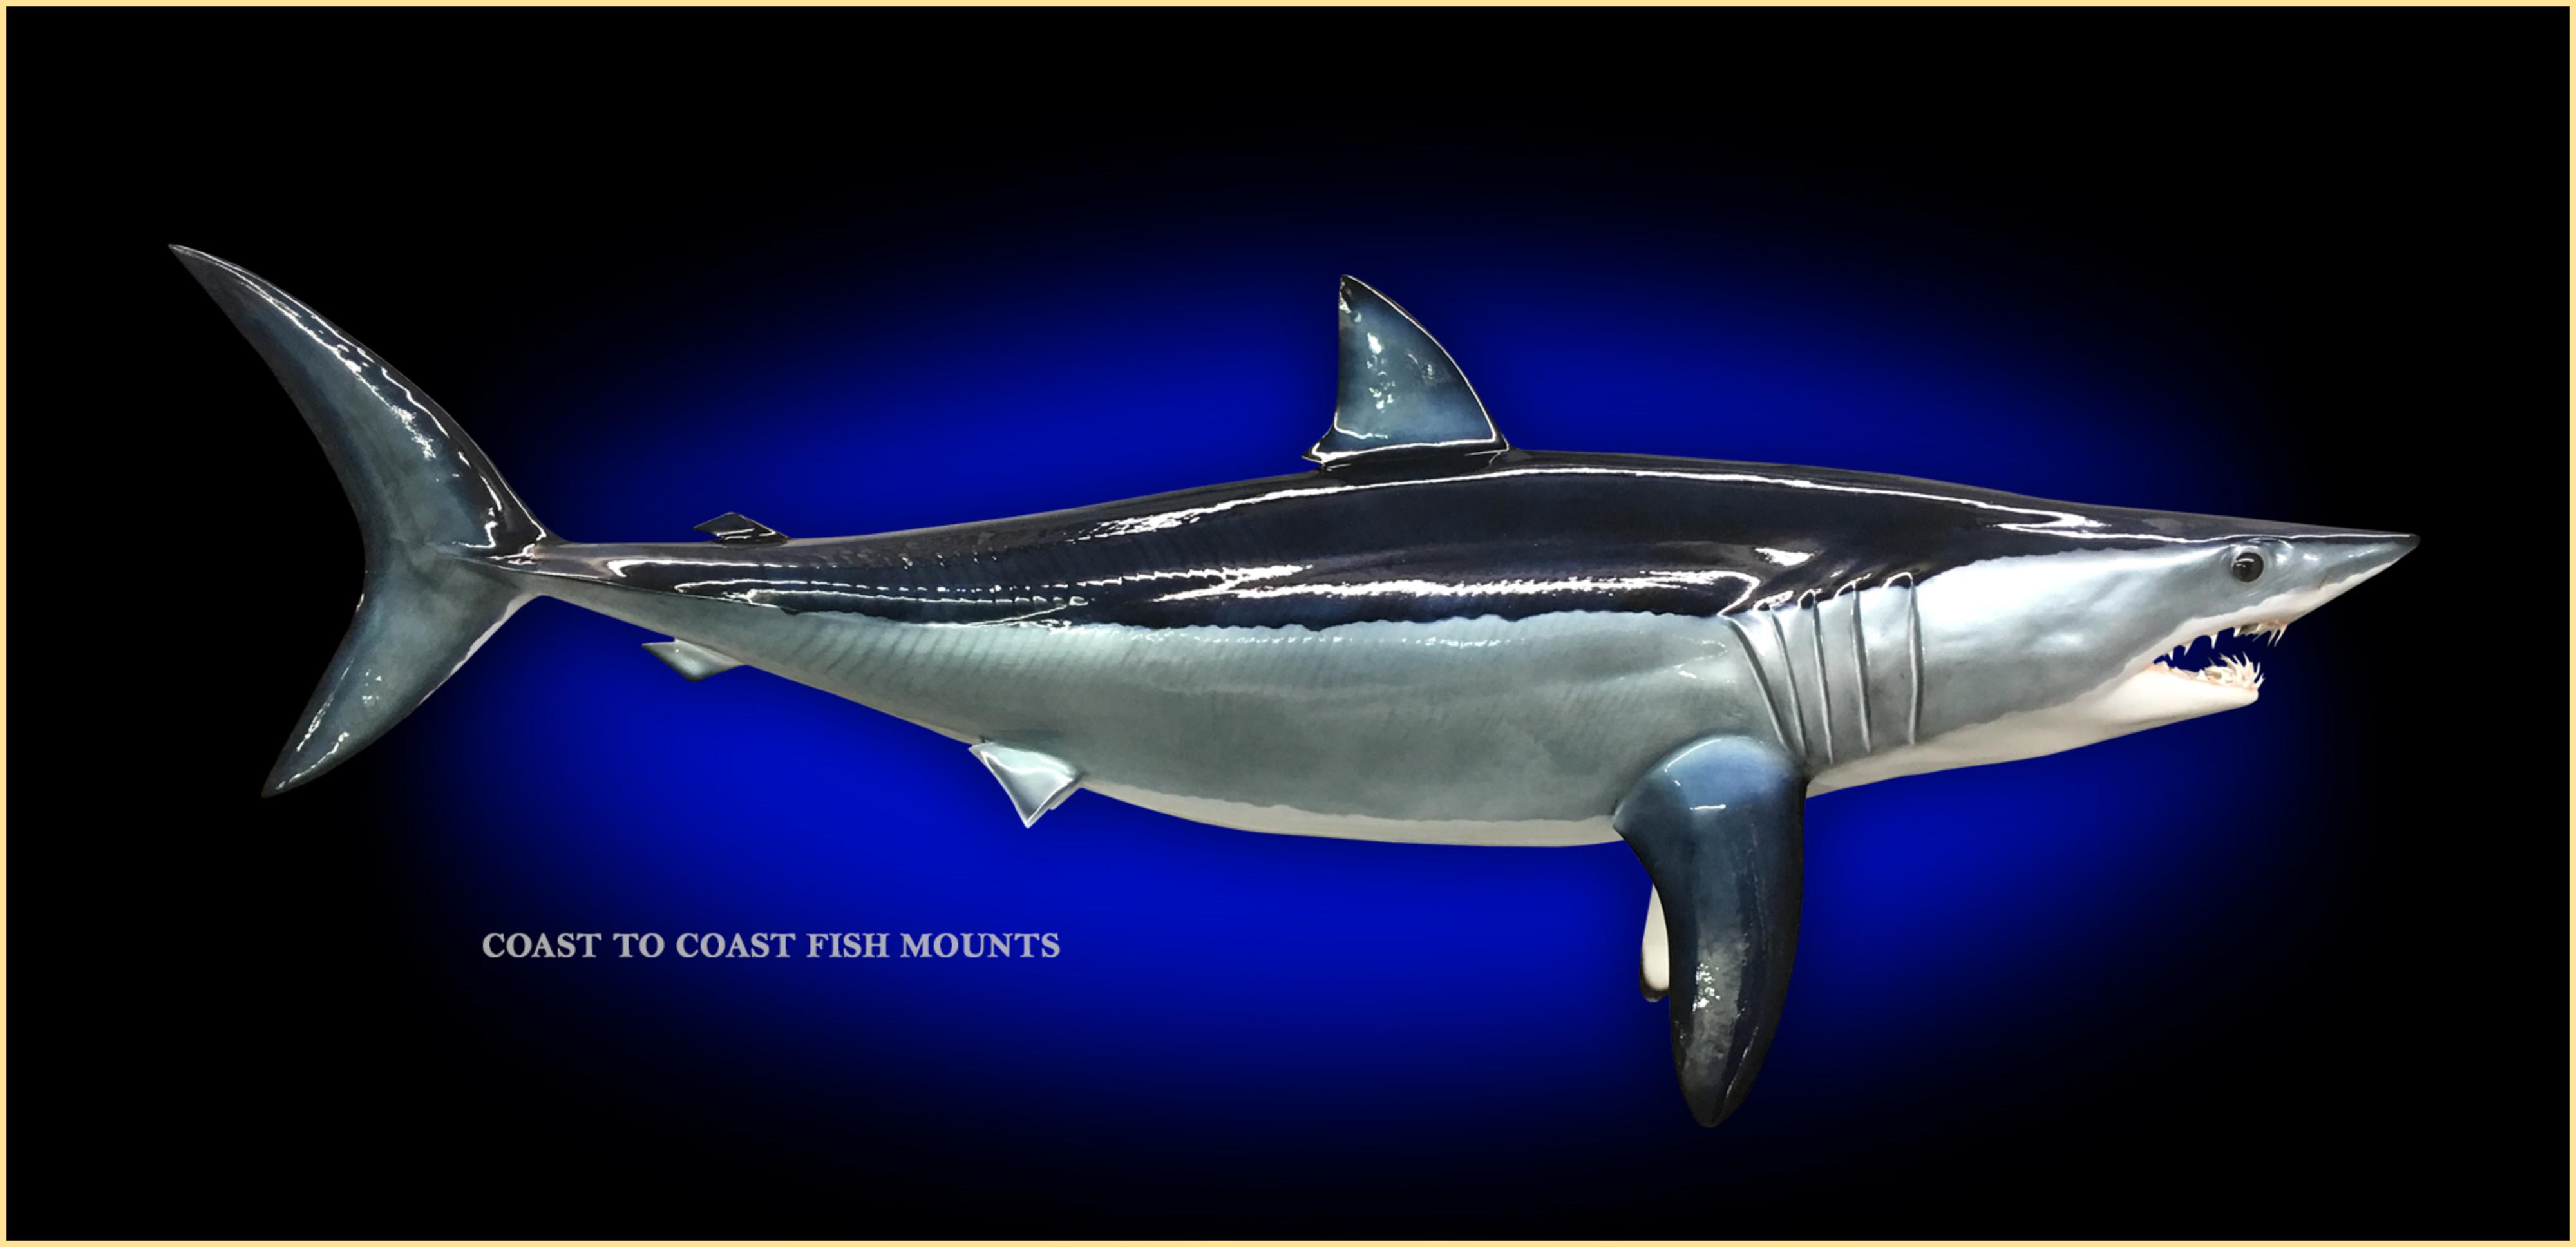 Mako shark fish mount and fish replicas coast to coast mako shark fish mount altavistaventures Images